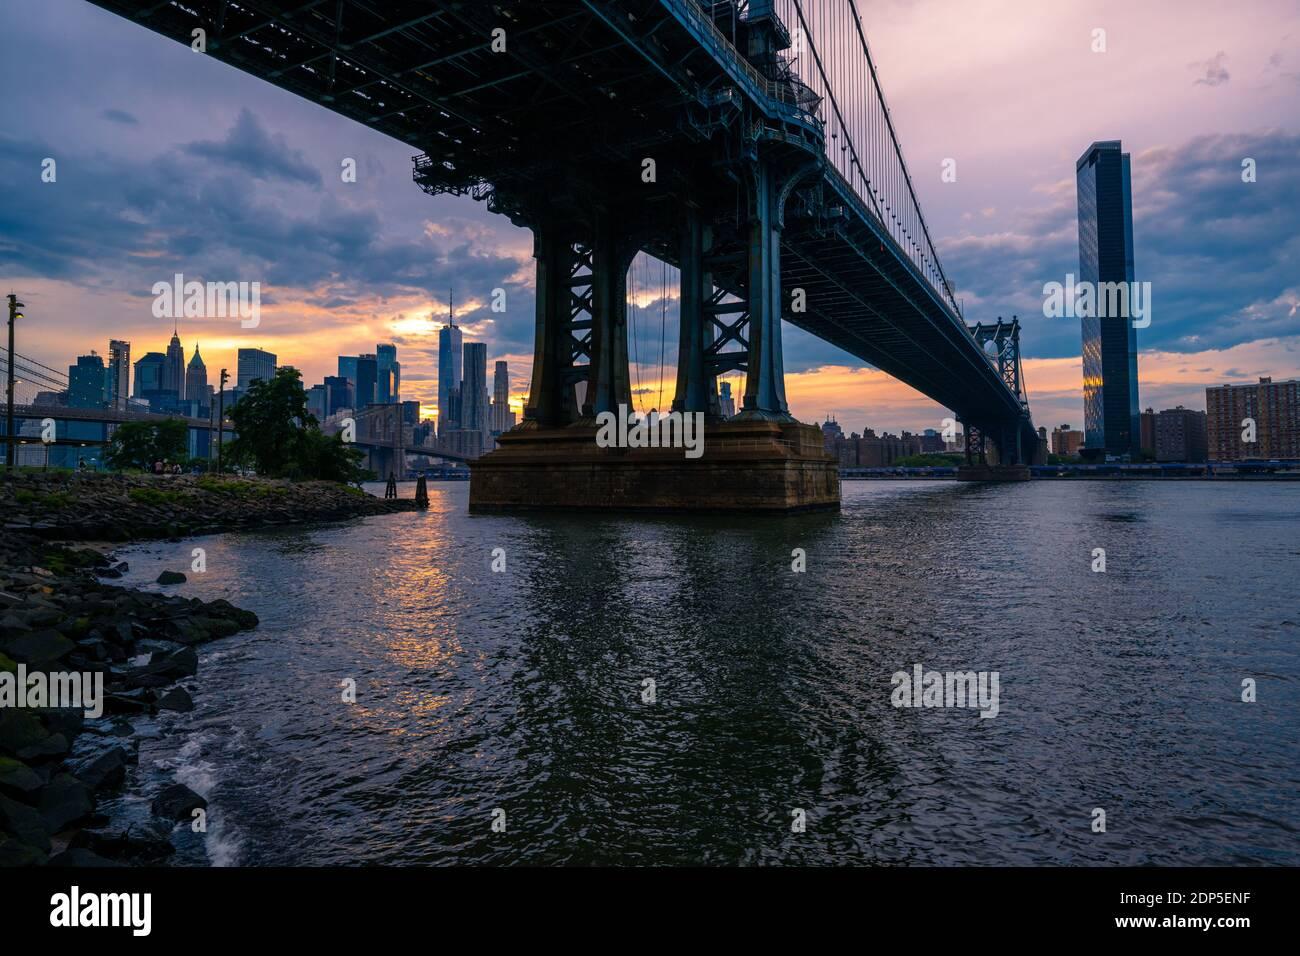 View on Lower Manhattan, Brooklyn Bridge and Manhattan Bridge from the DUMBO Brooklyn, NY Stock Photo